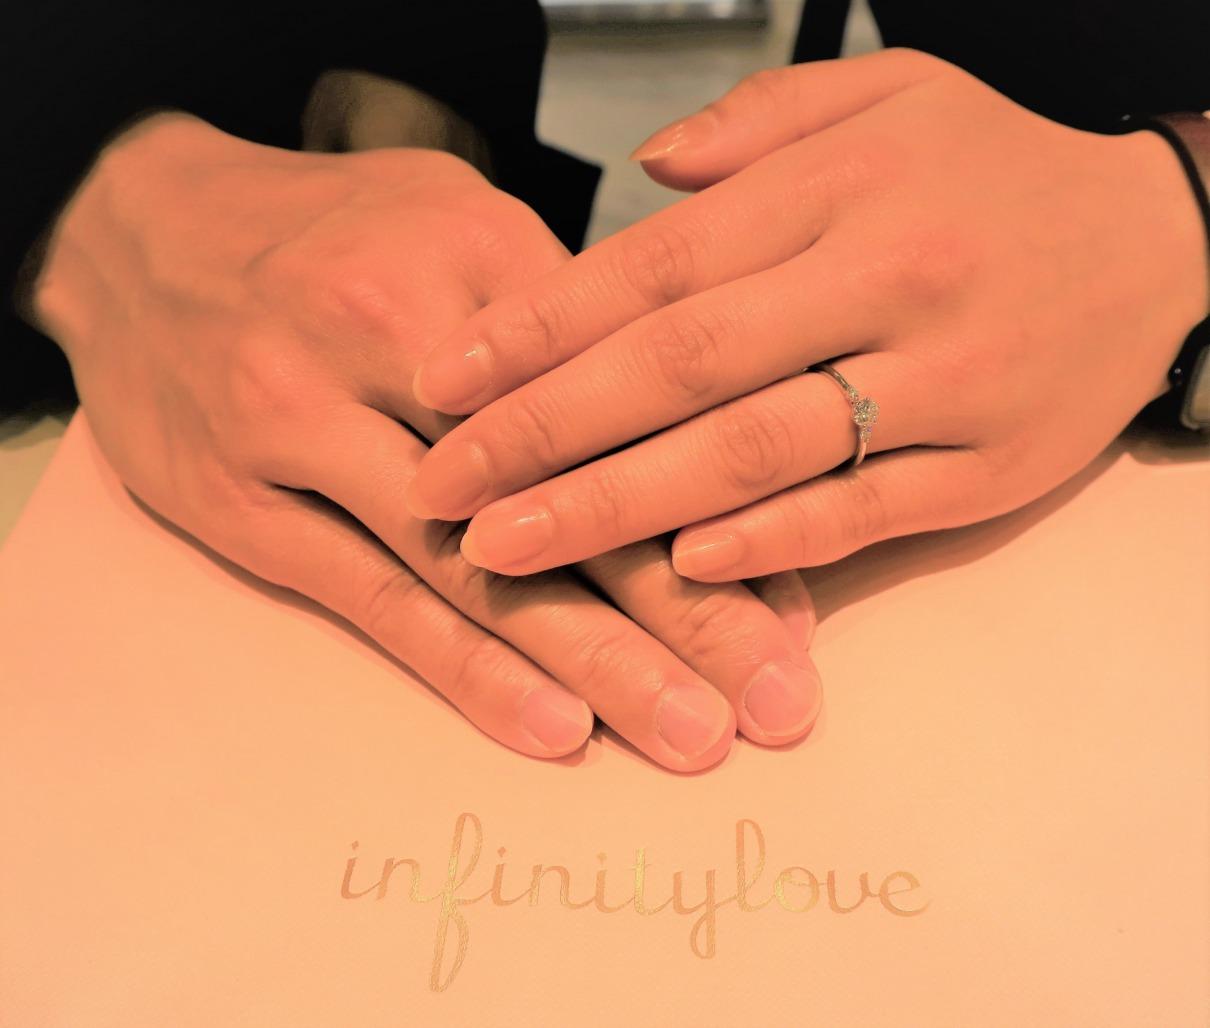 Jasmineの婚約指輪 ダイヤモンドのバックグラウンドに惹かれました